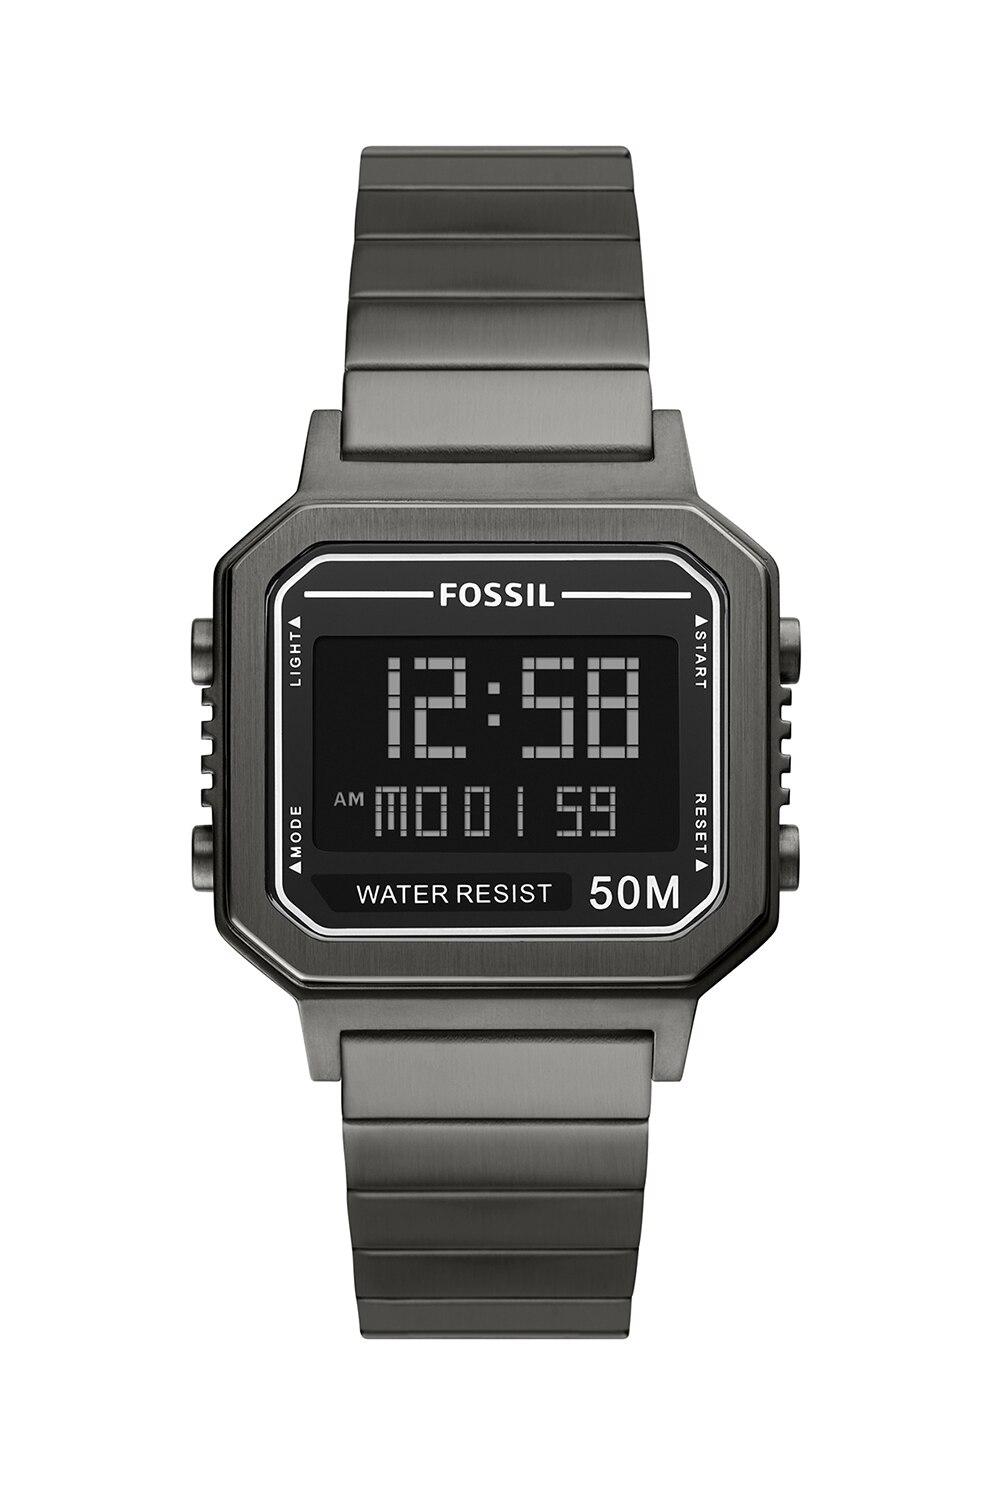 Fotografie Fossil, Ceas digital cu bratara de otel inoxidabil, Argintiu inchis